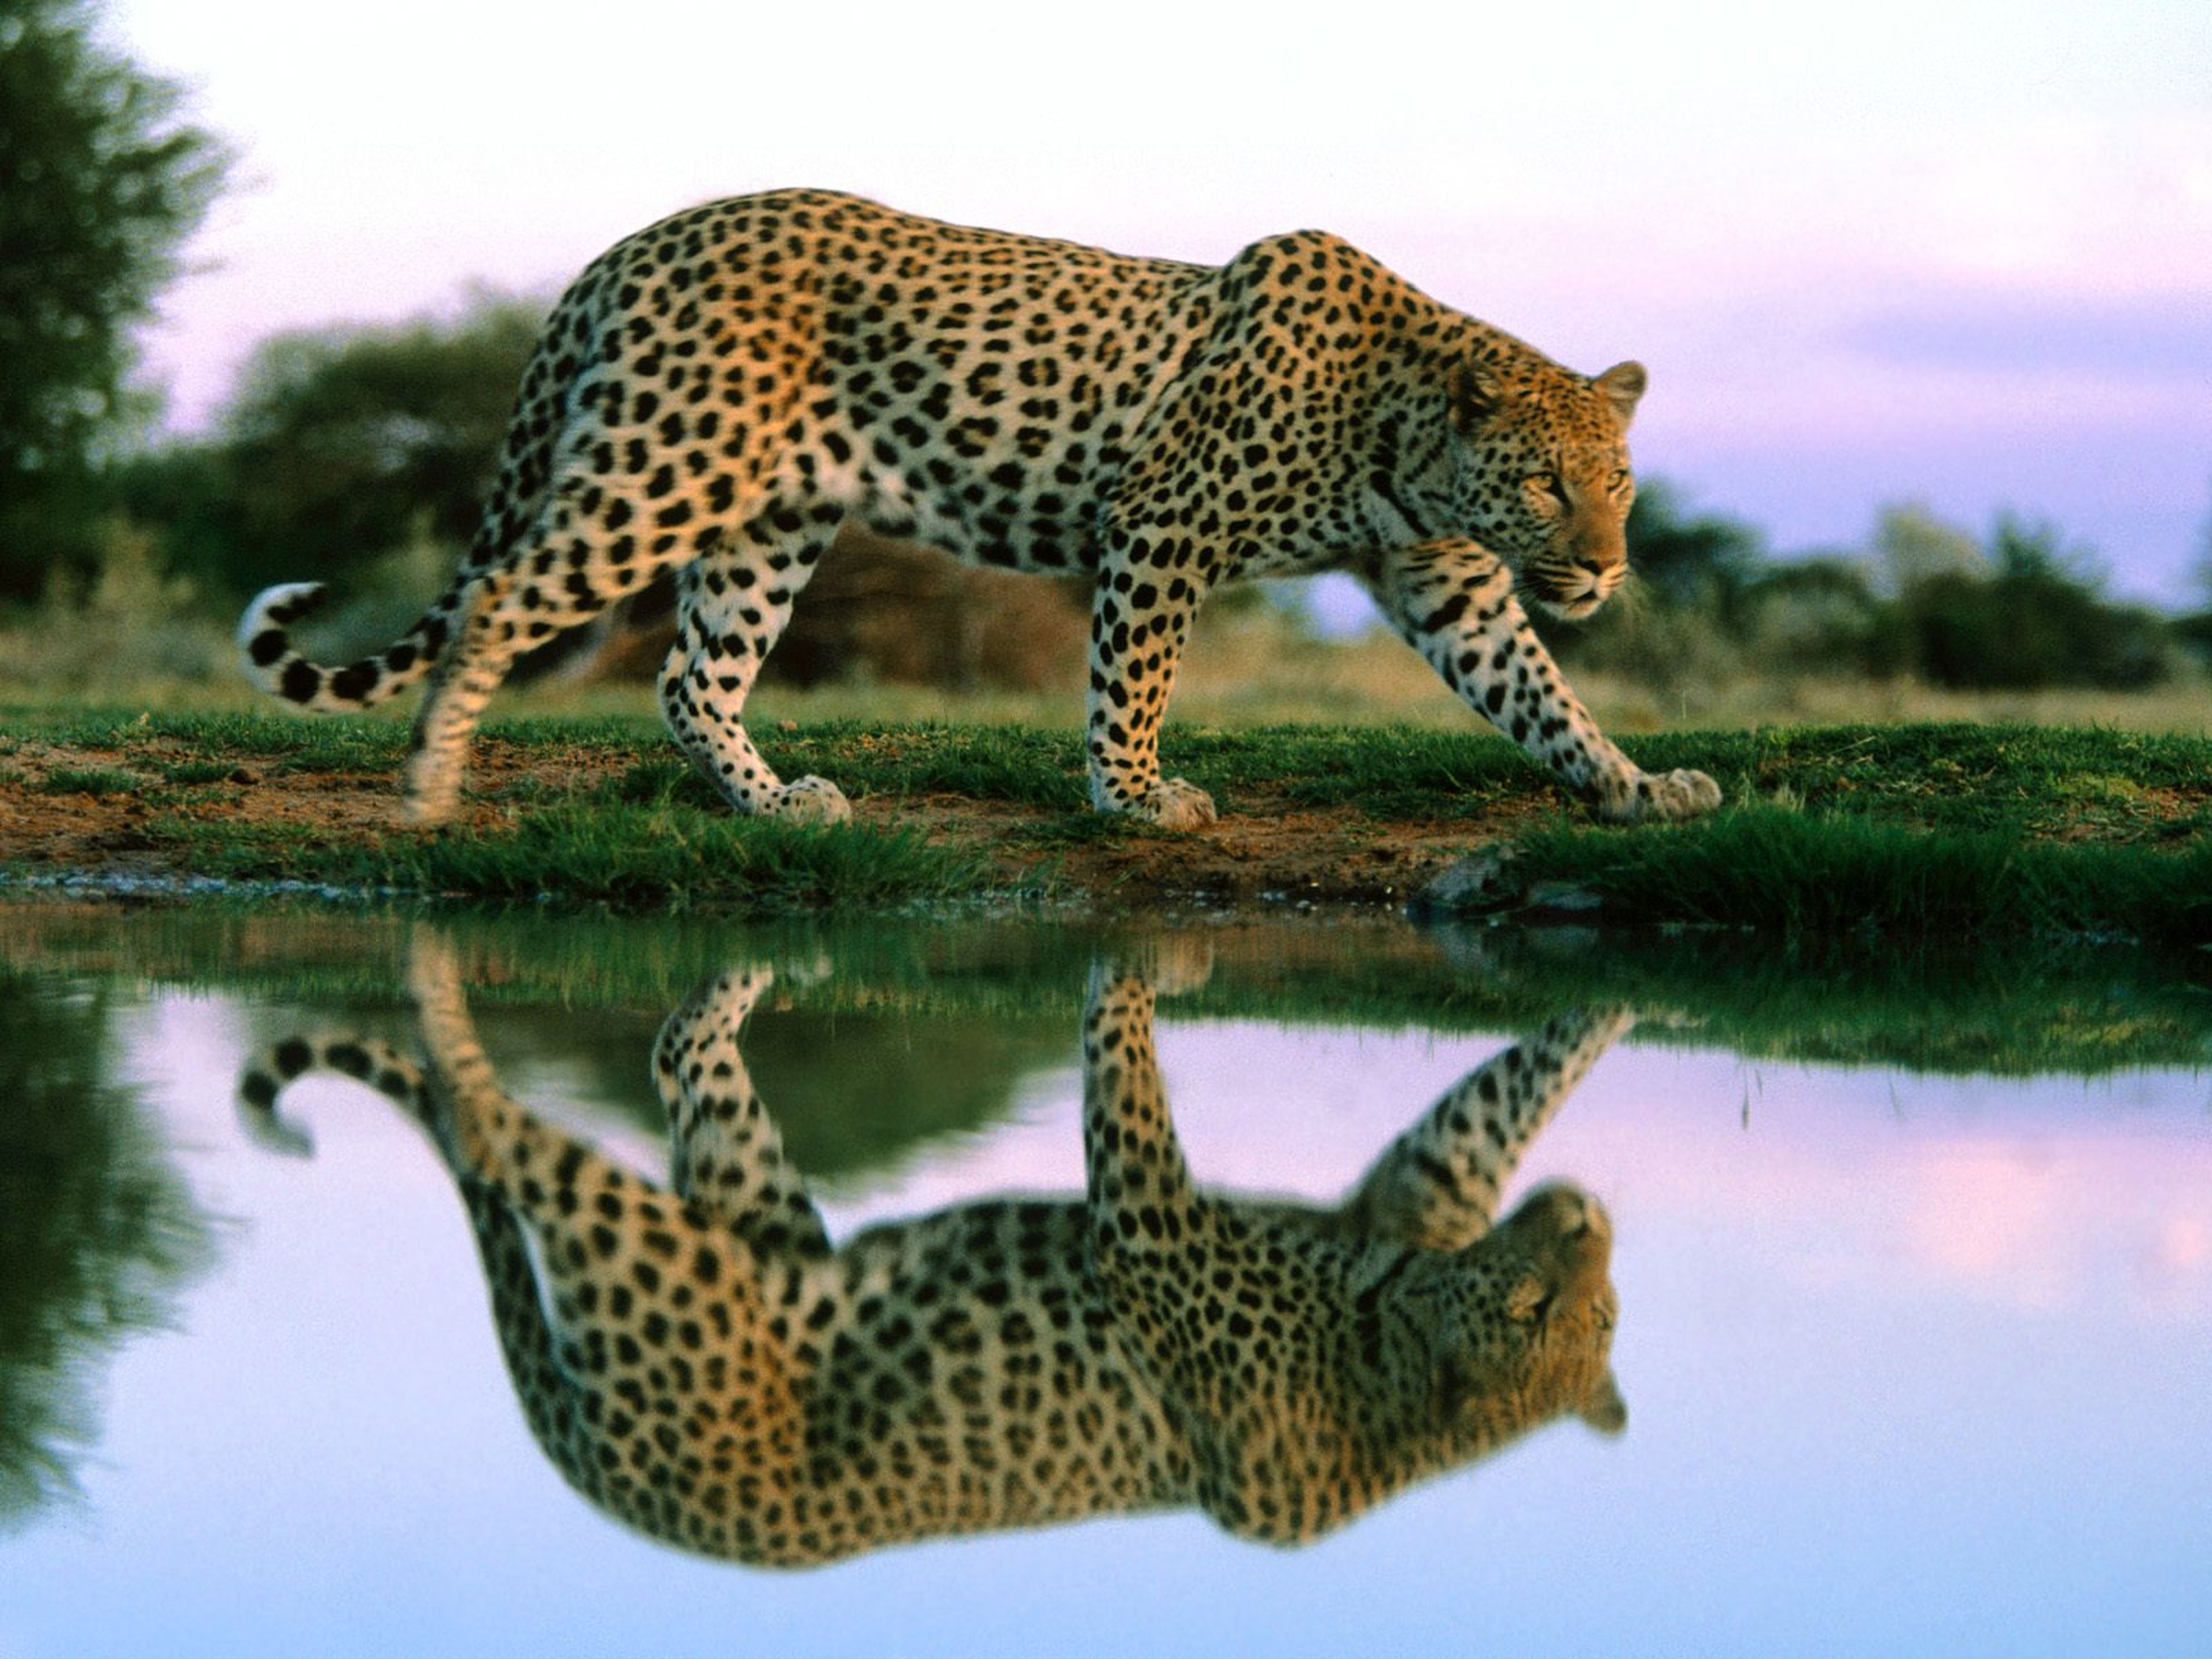 animal themes, animals in the wild, wildlife, mammal, one animal, safari animals, animal markings, giraffe, leopard, side view, undomesticated cat, relaxation, forest, zoo, nature, big cat, tiger, cheetah, day, carnivora